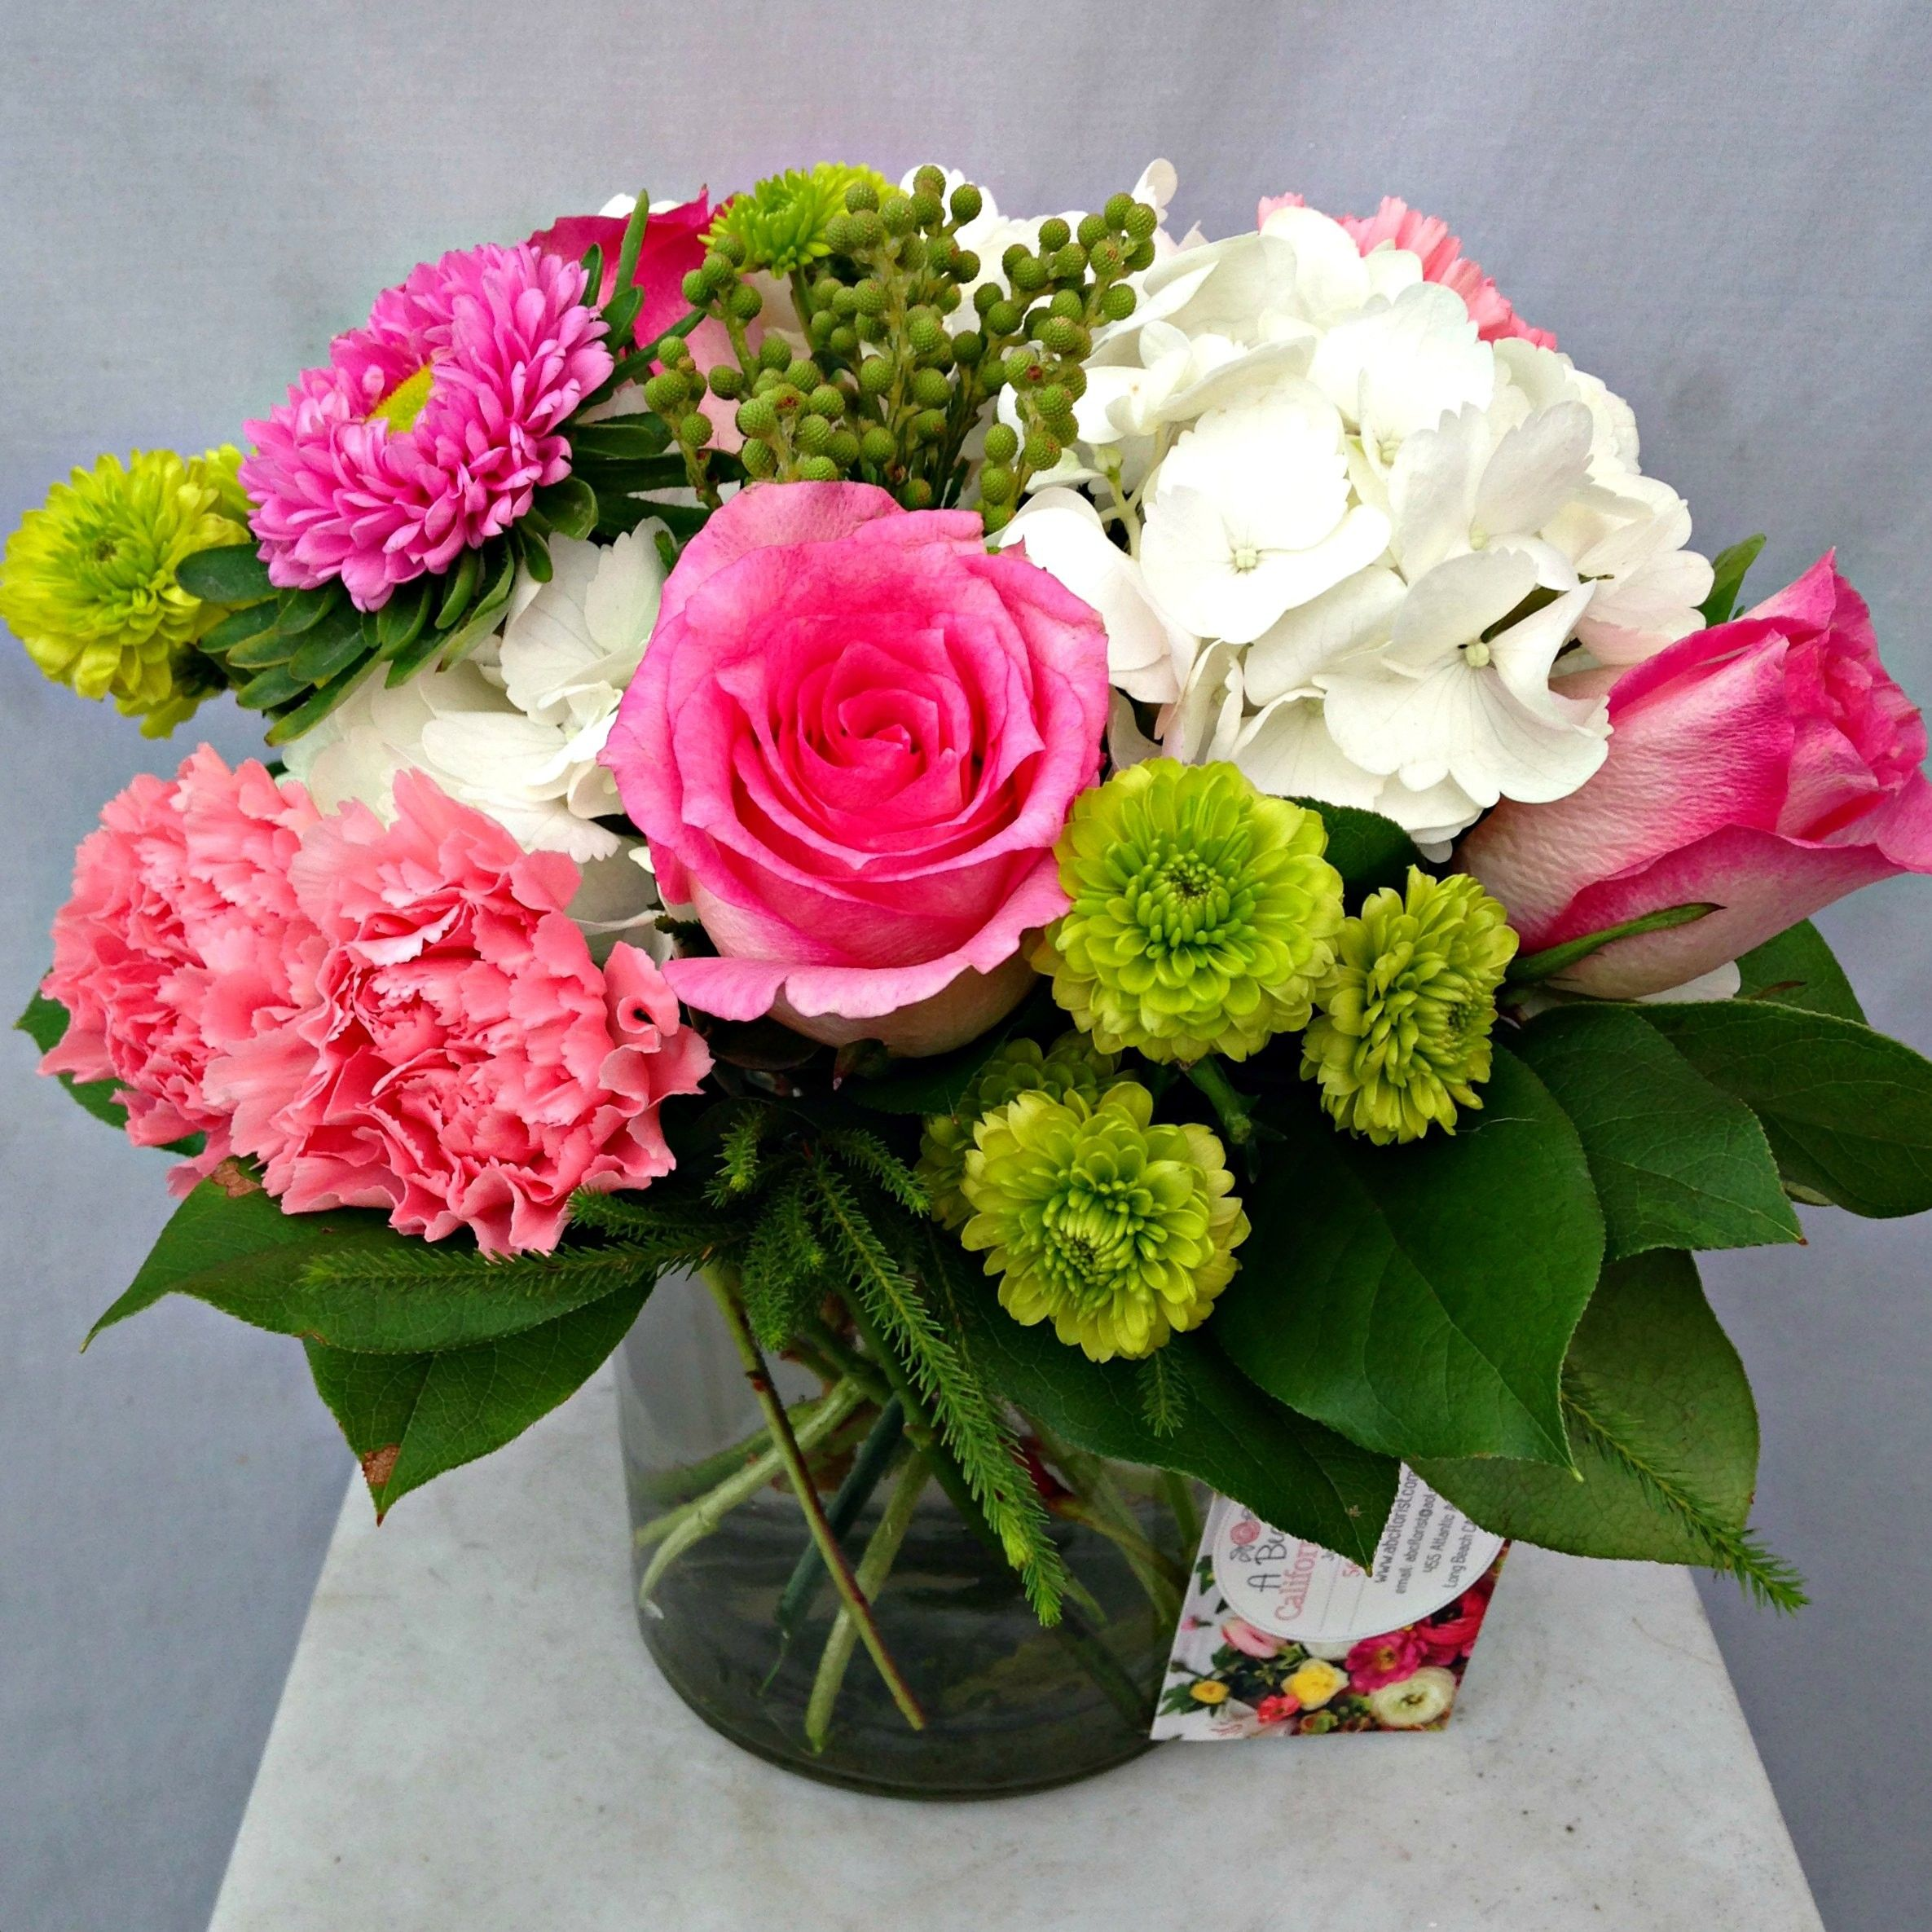 Imagen relacionada arreglos florales pinterest candy cane imagen relacionada izmirmasajfo